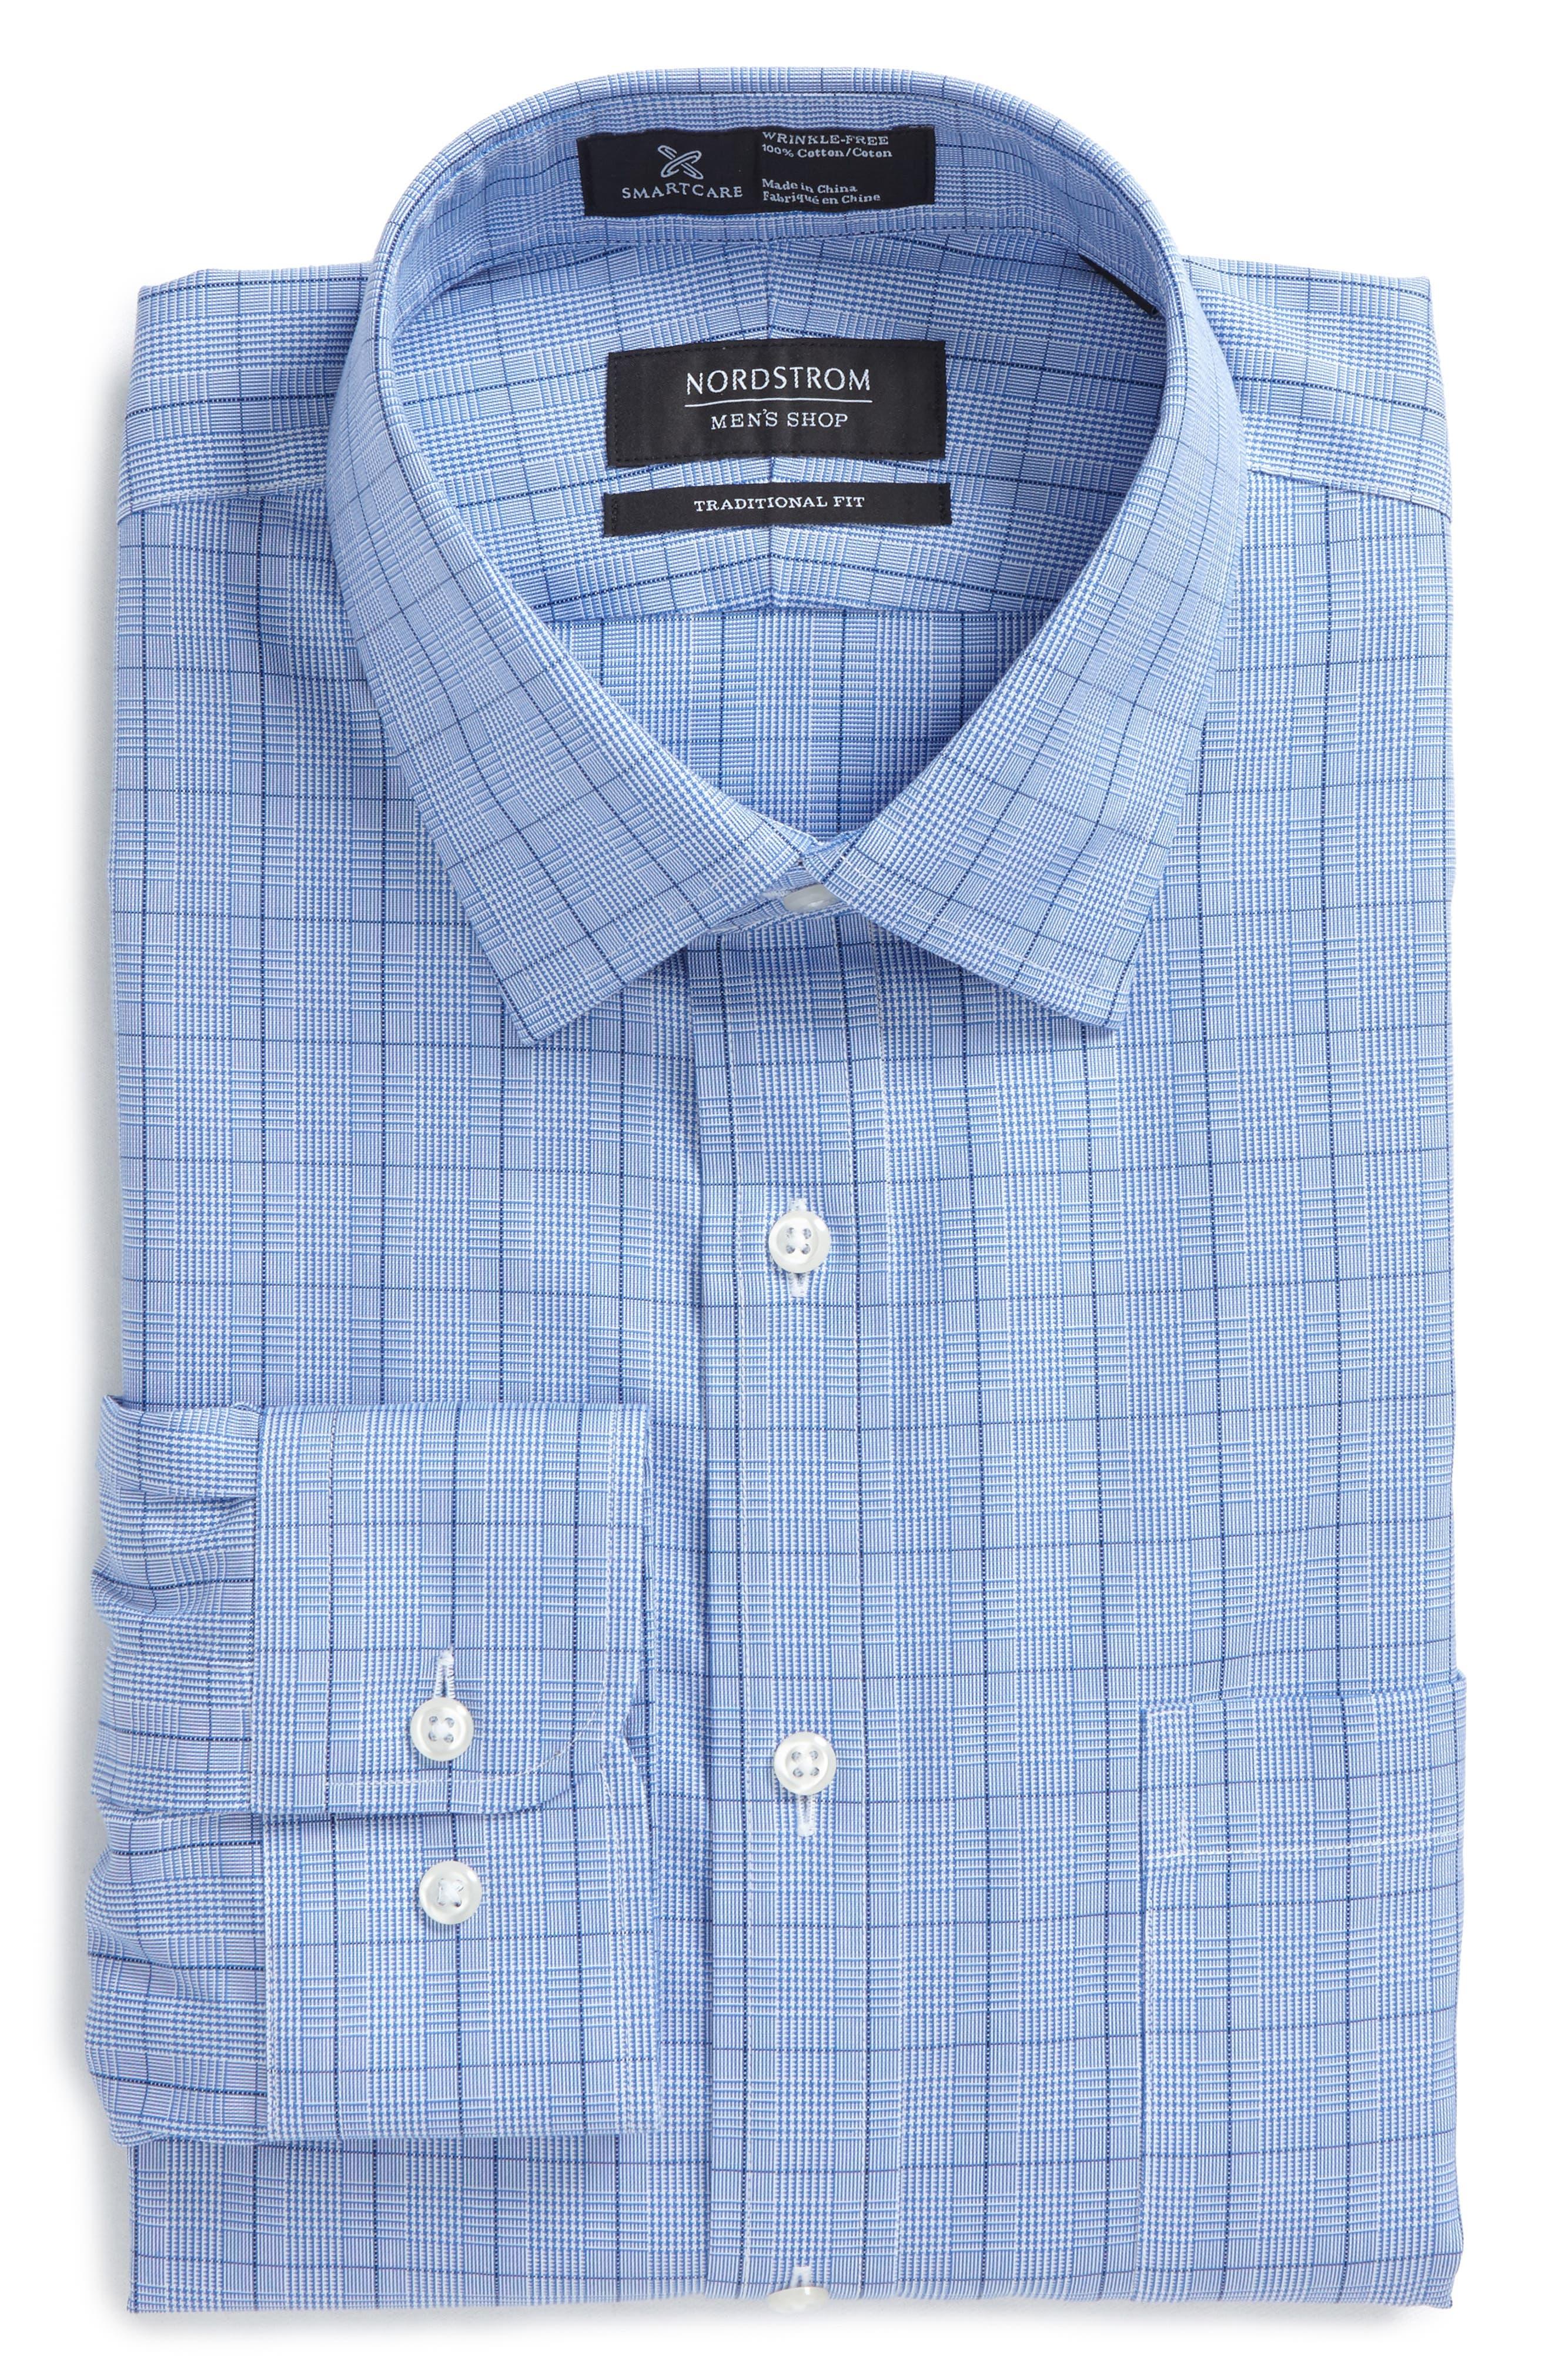 Alternate Image 2  - Nordstrom Men's Shop Smartcare™ Traditional Fit Windowpane Dress Shirt